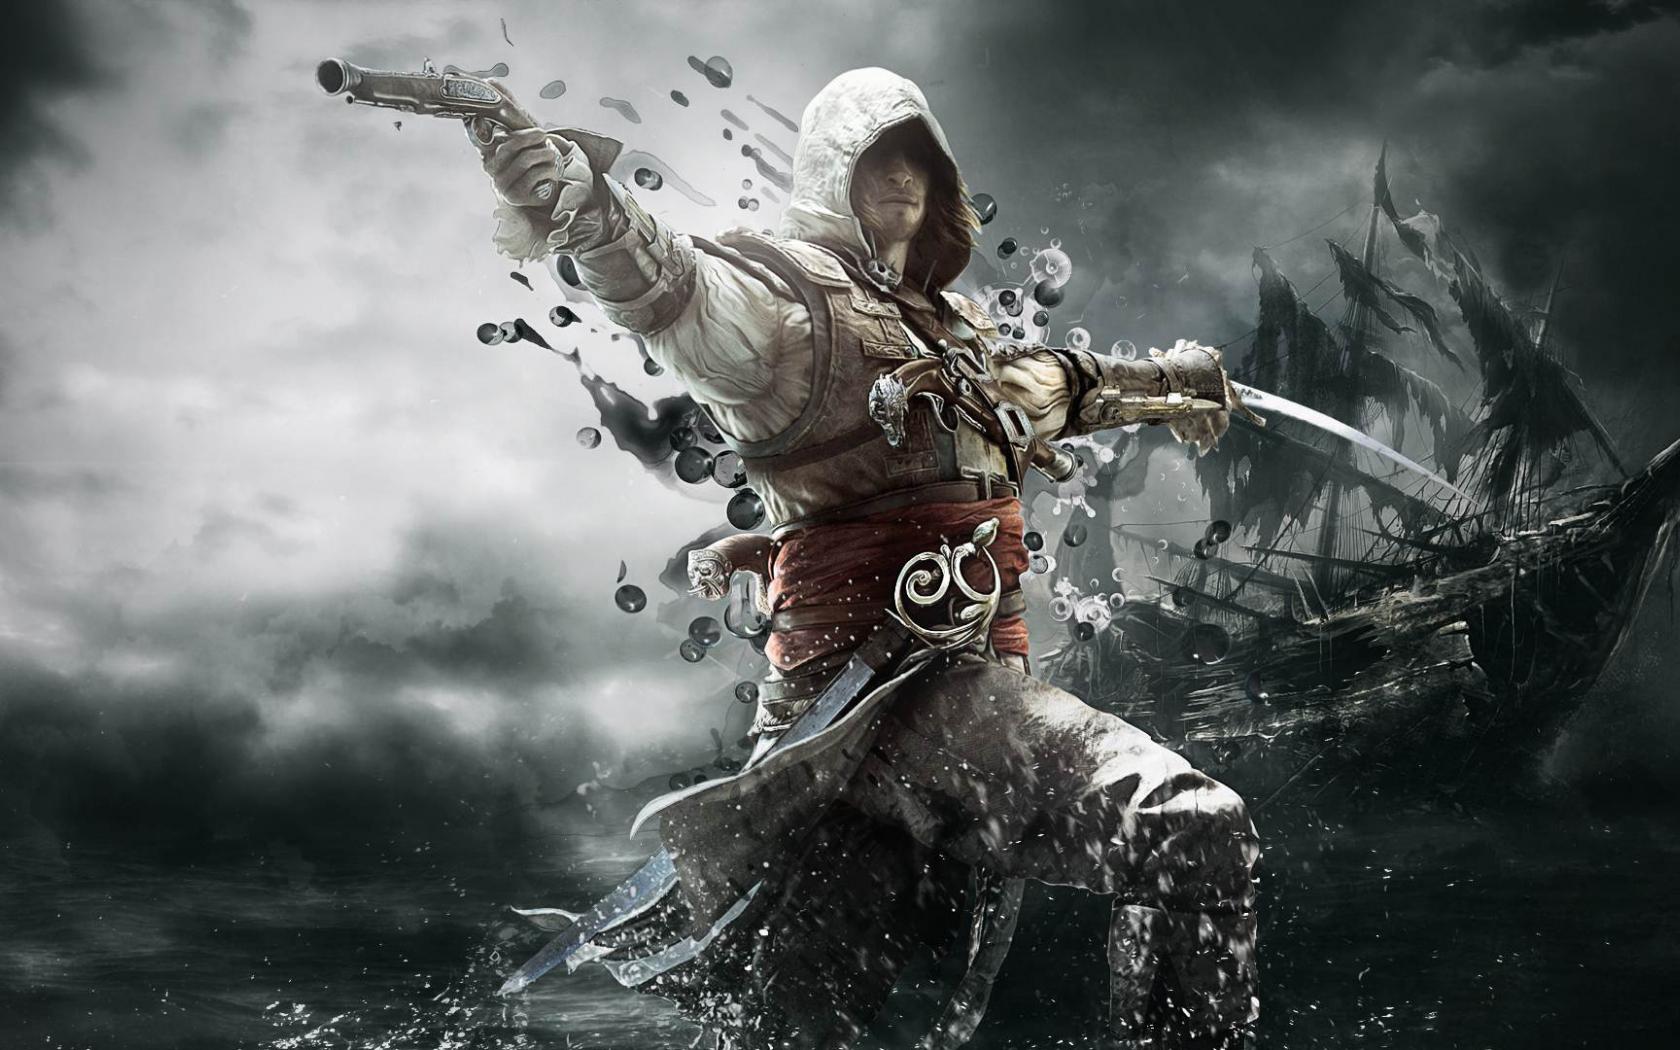 Free Download Assassins Creed 4 Black Flag Wallpapers En 1080p Hd